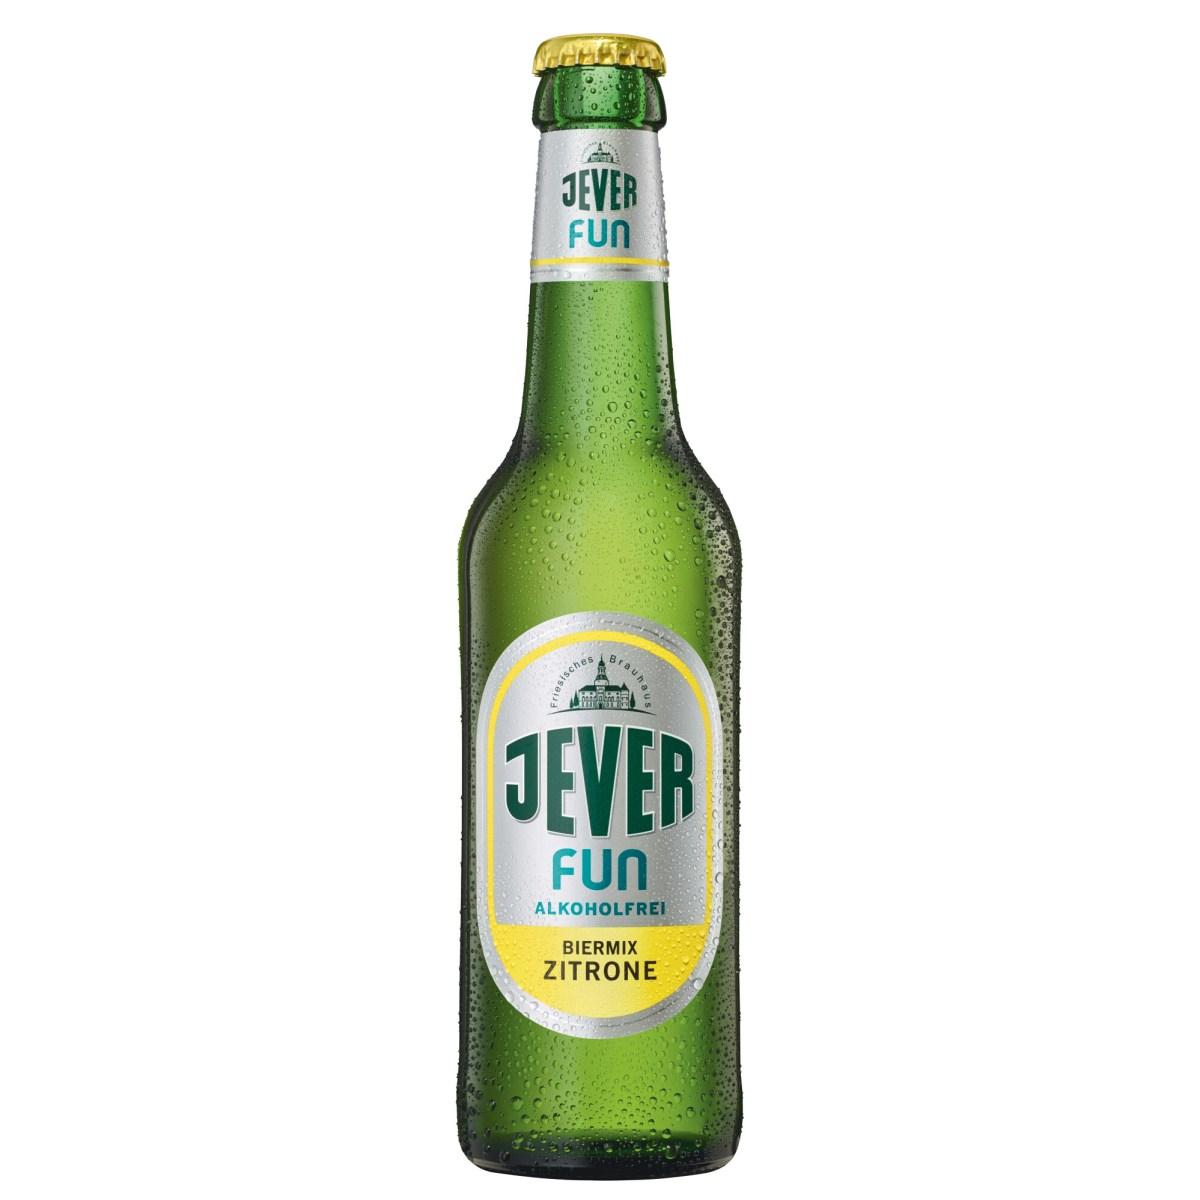 Jever Fun Zitrone alkoholfrei 0,33l